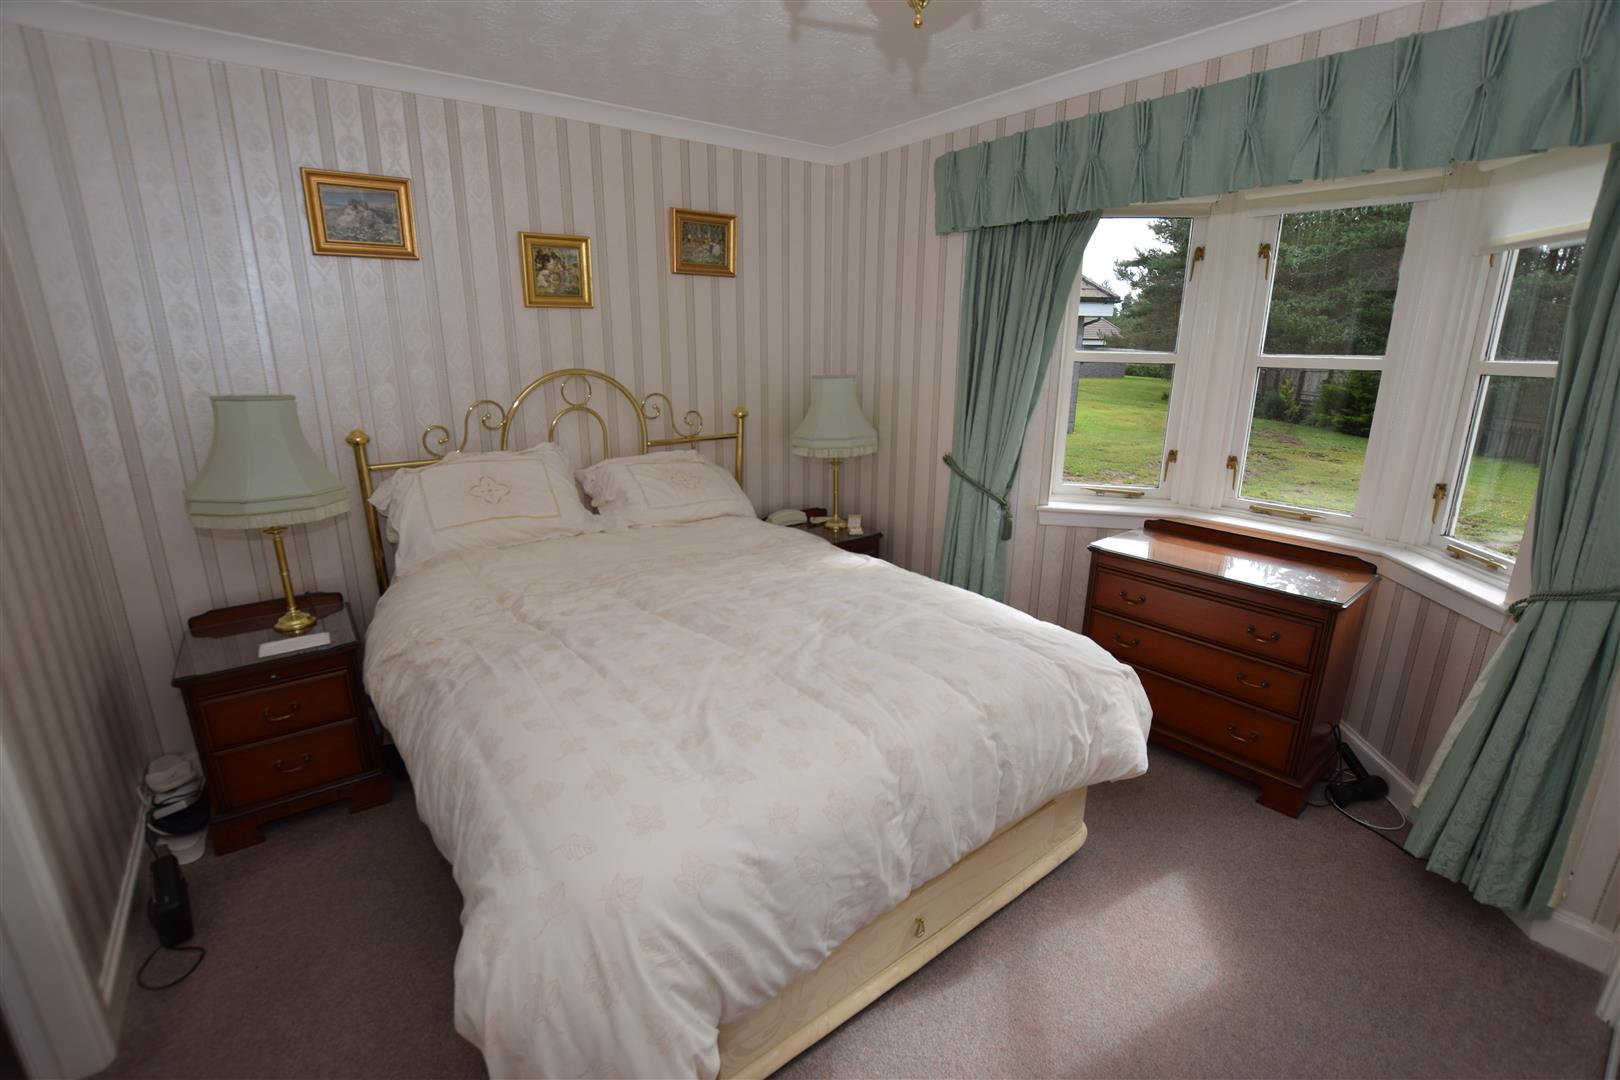 16, Windsor Gardens, Gleneagles, Auchterarder, Perthshire, PH3 1QE, UK